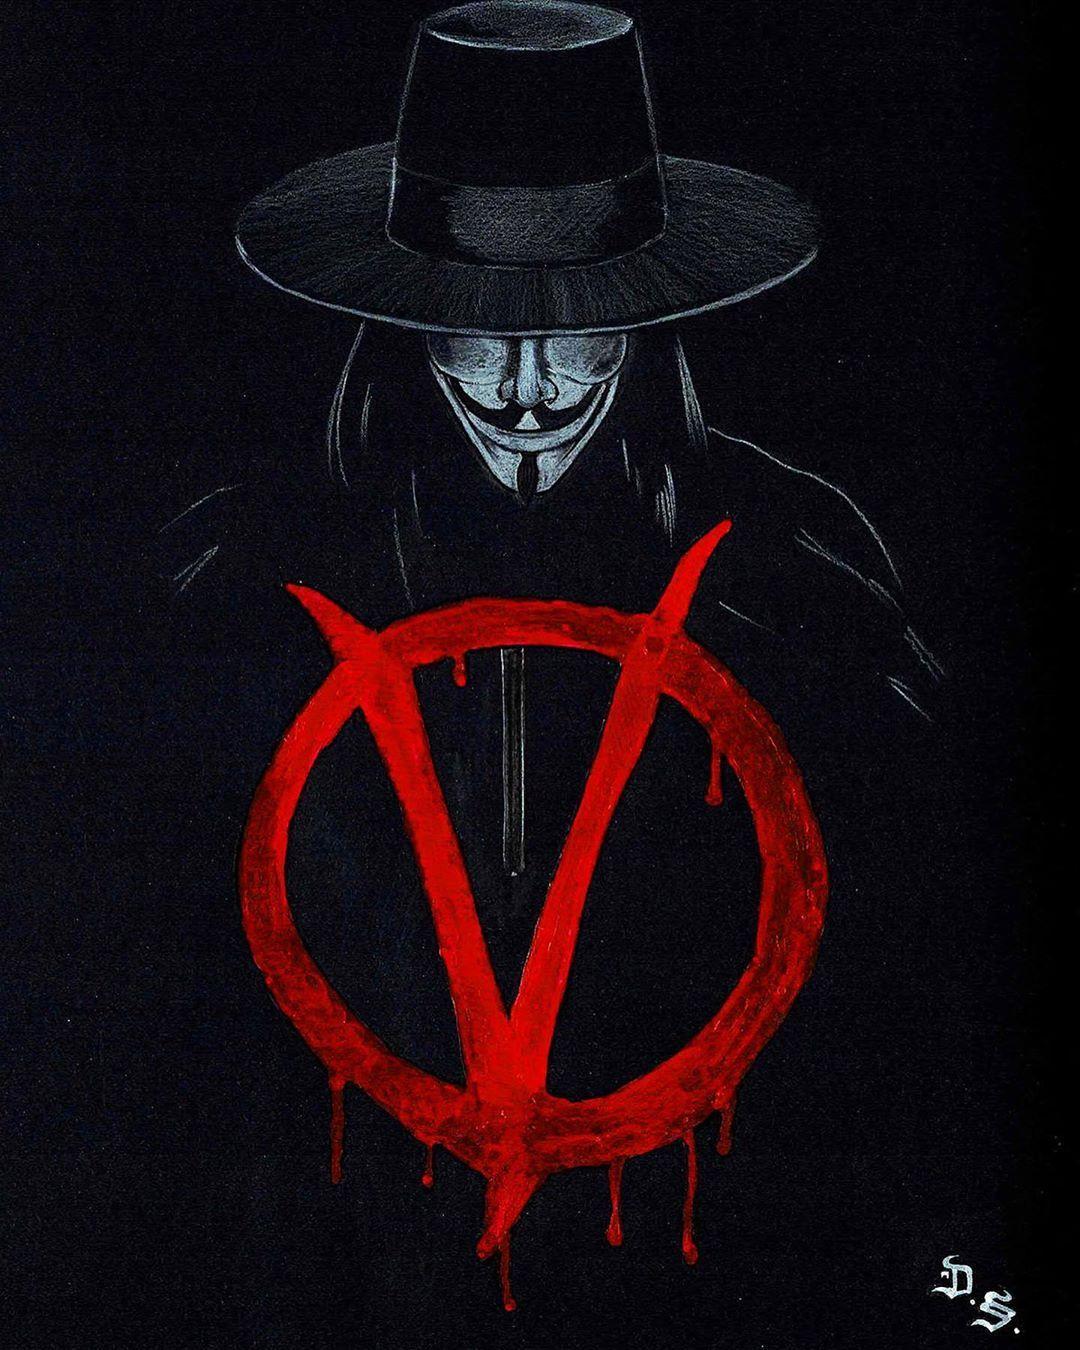 Remember Remember The 5th Of November Vforvandetta Dccomics Rogue Comics Is Sharing Instagram Posts An V For Vendetta Tattoo V For Vendetta Original Drawing